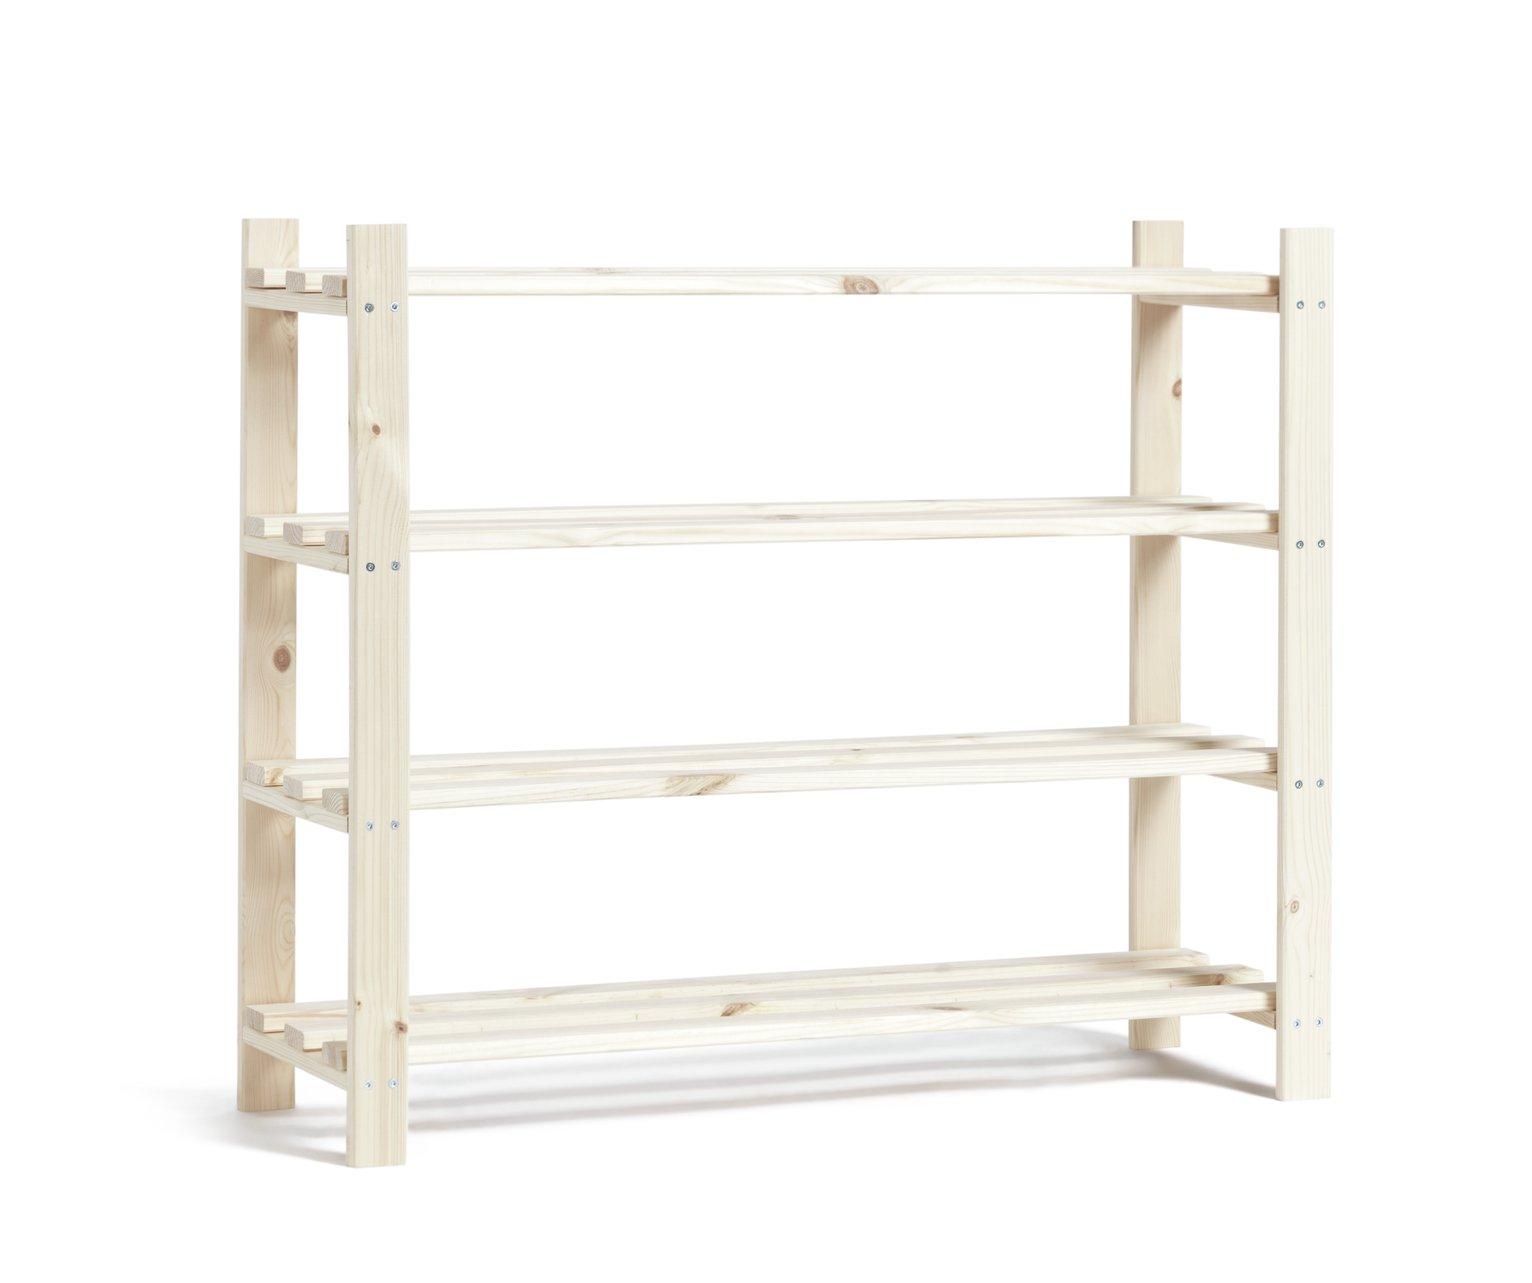 Argos Home 4 Shelf Shoe Storage Rack - Solid Unfinished Pine